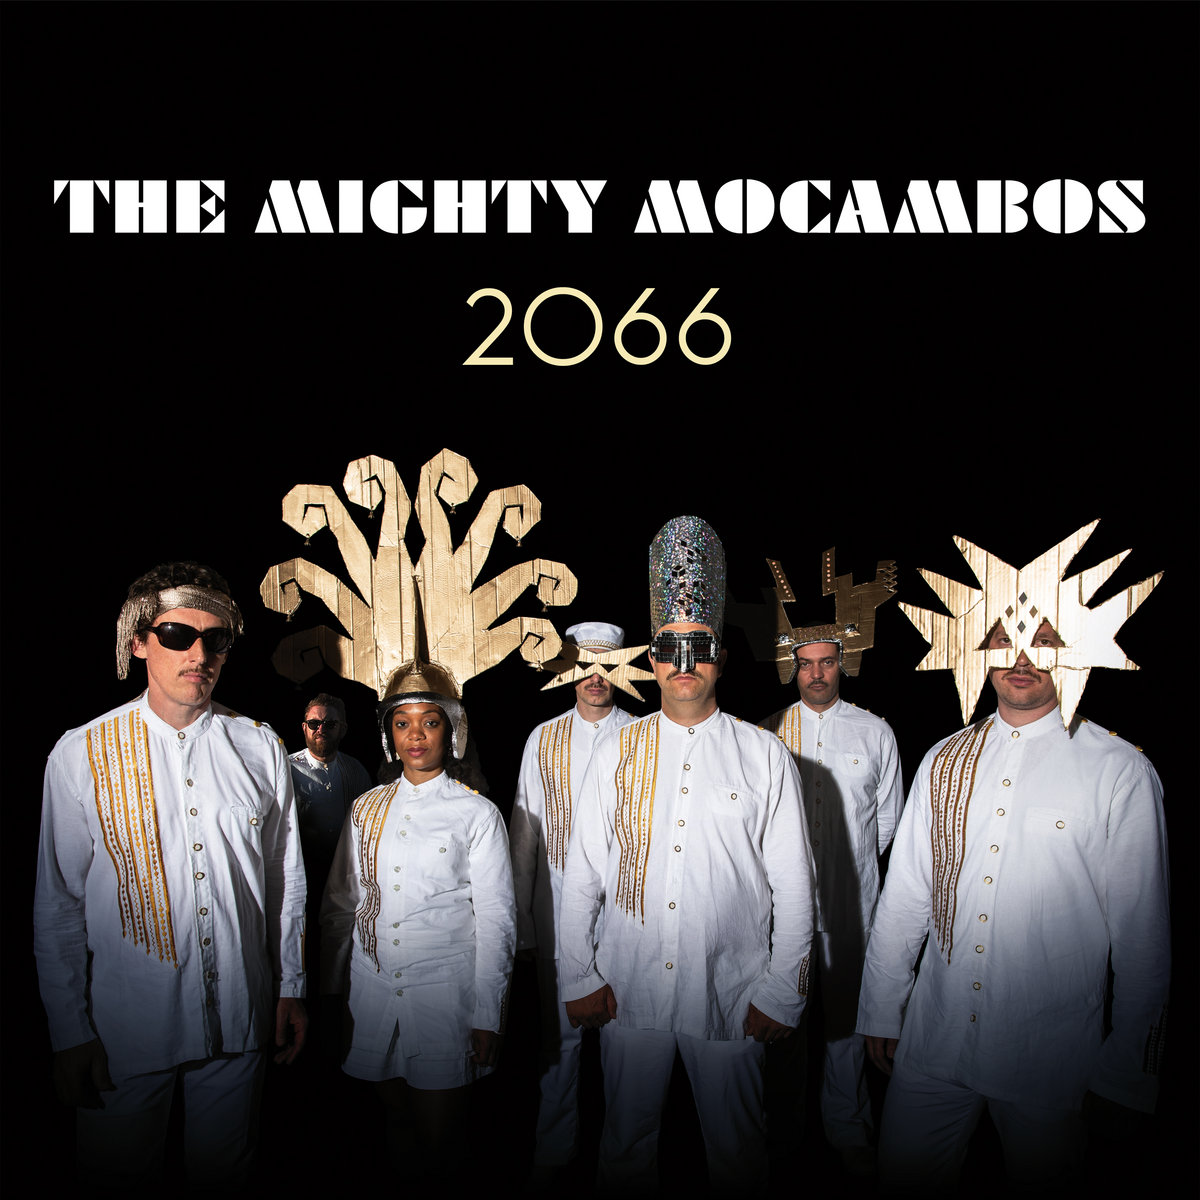 THE MIGHTY MOCAMBOS - 2066